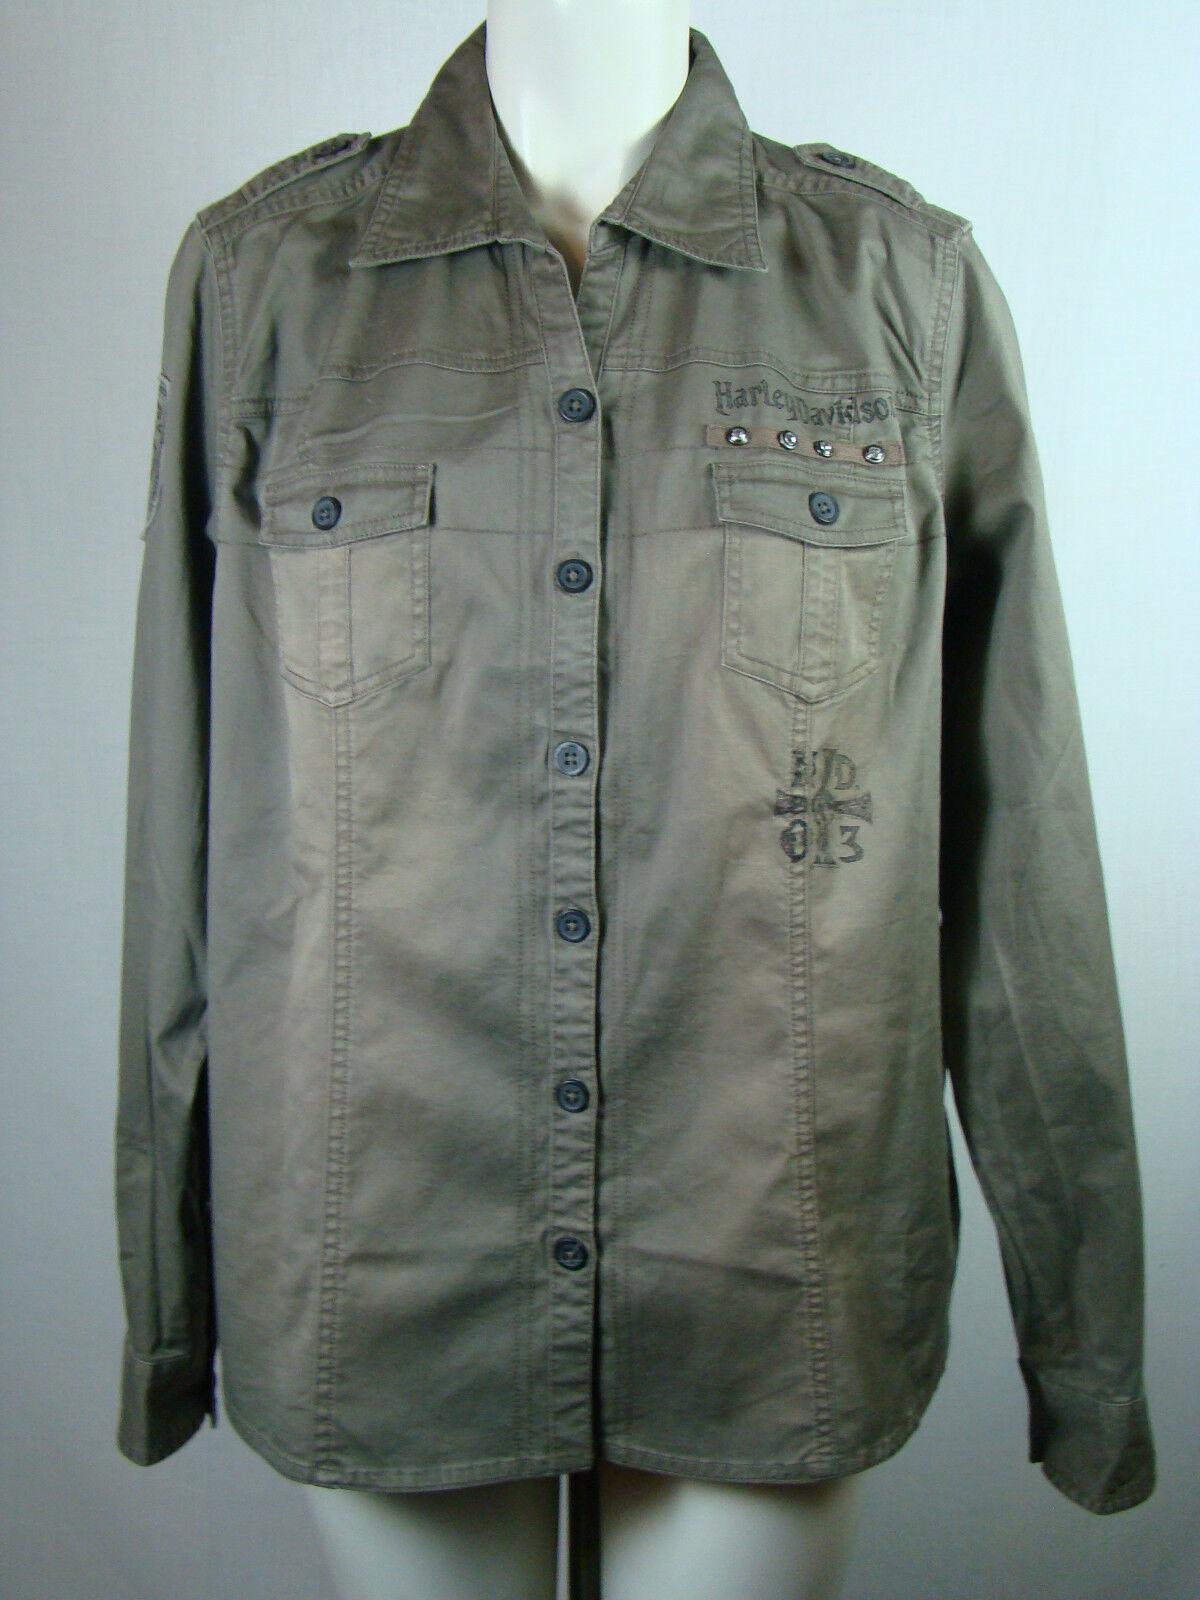 Harley-Davidson Woherren Vintage Wash Twill Long Sleeve Shirt Grün 96112 XL